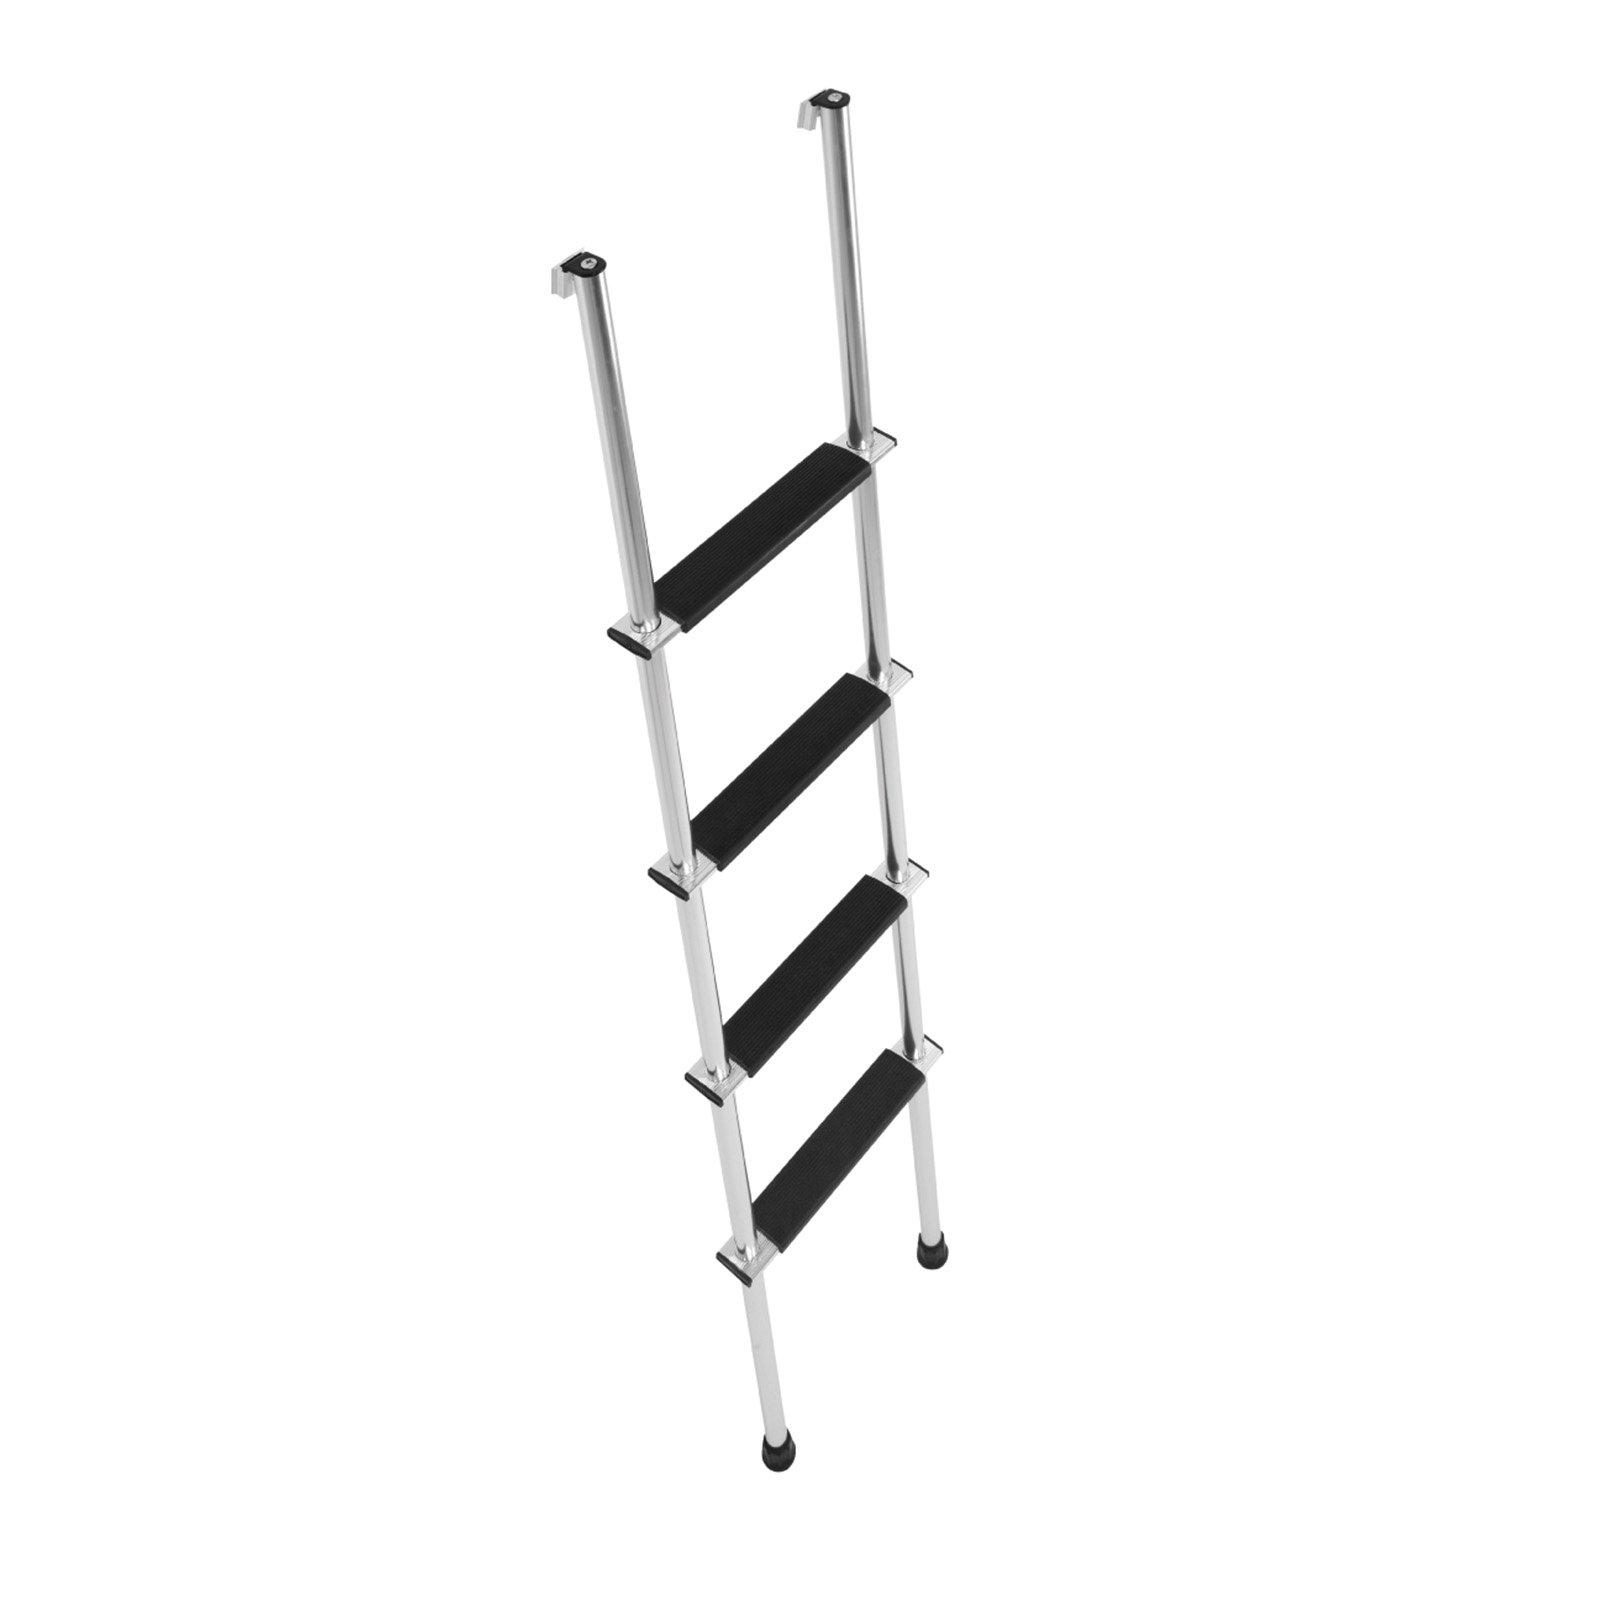 Stromberg Carlson 60 Inch LA-460 Bunk Ladder-60 by Stromberg Carlson (Image #1)